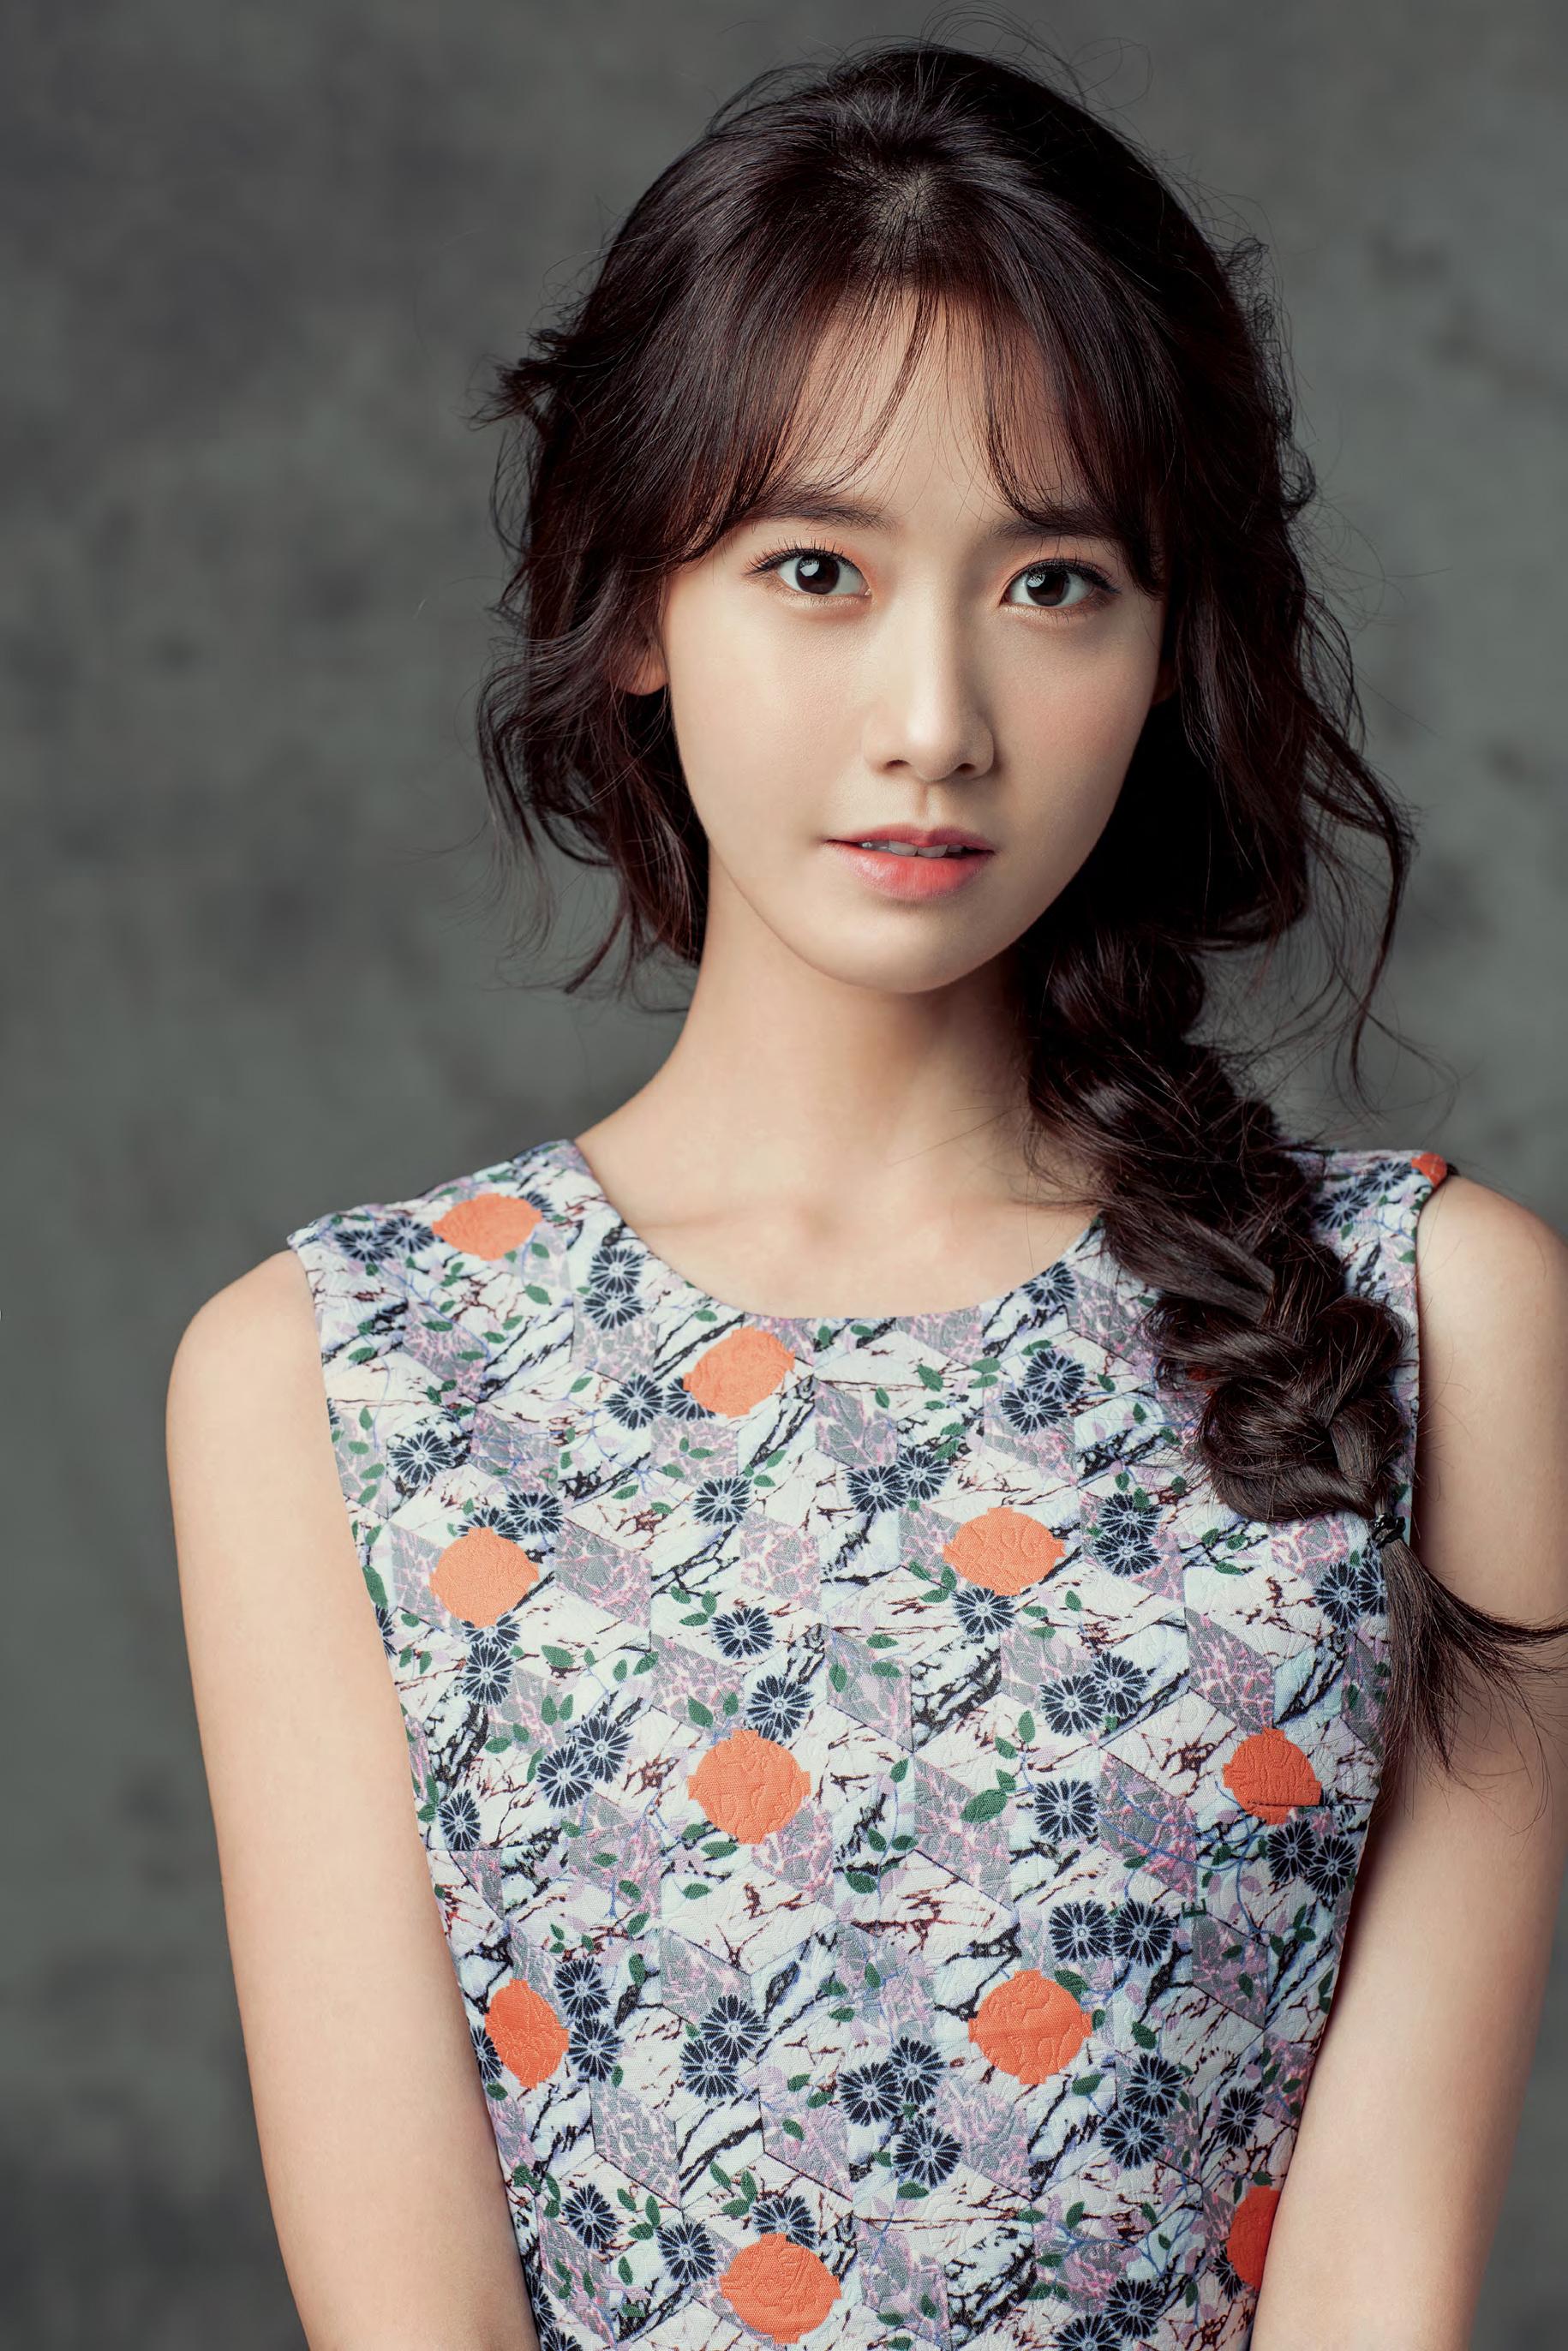 Fy-girls-generation | Kpop girls, Girls generation, Yoona snsd